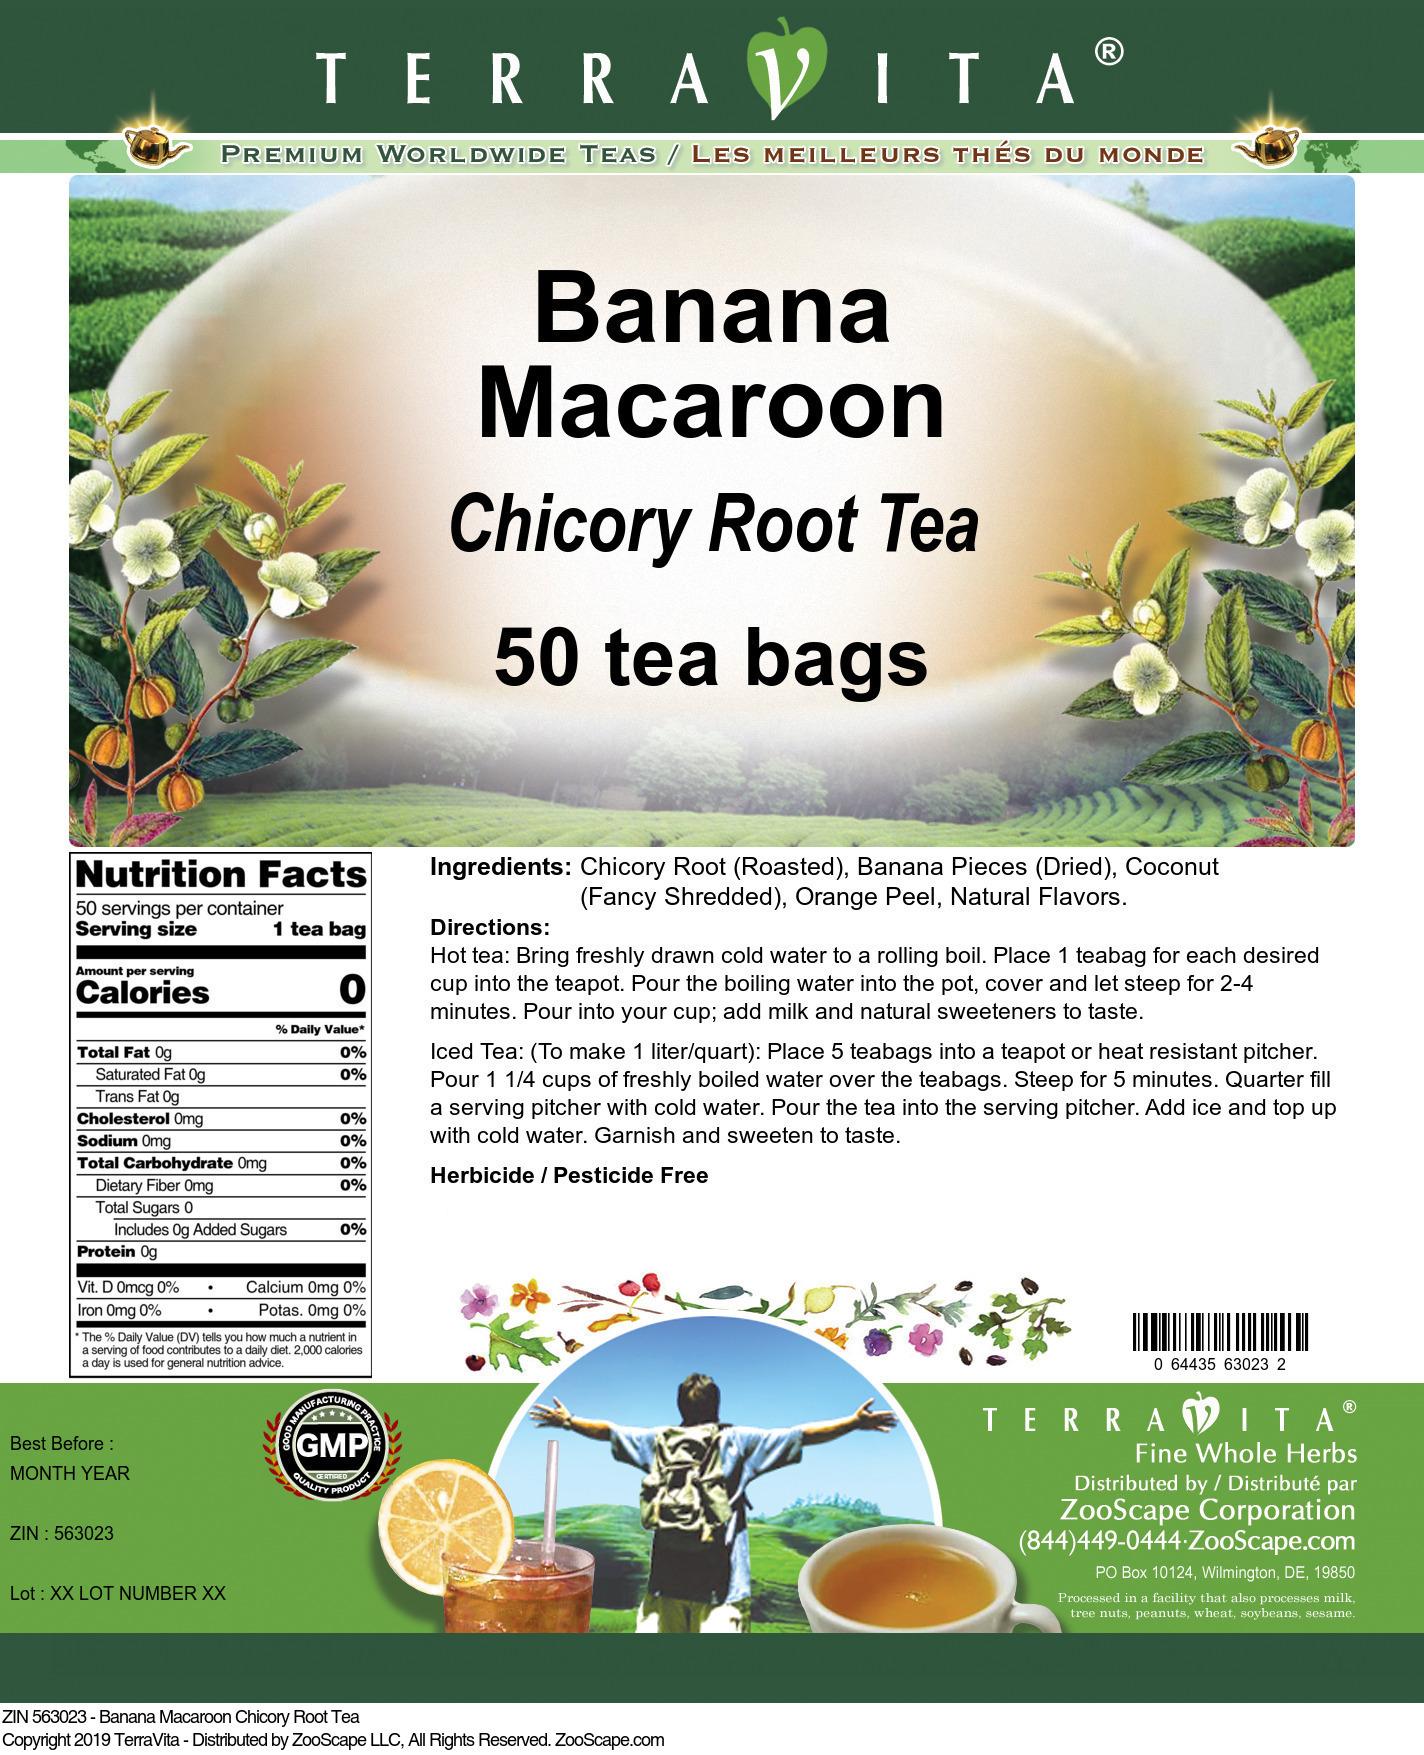 Banana Macaroon Chicory Root Tea